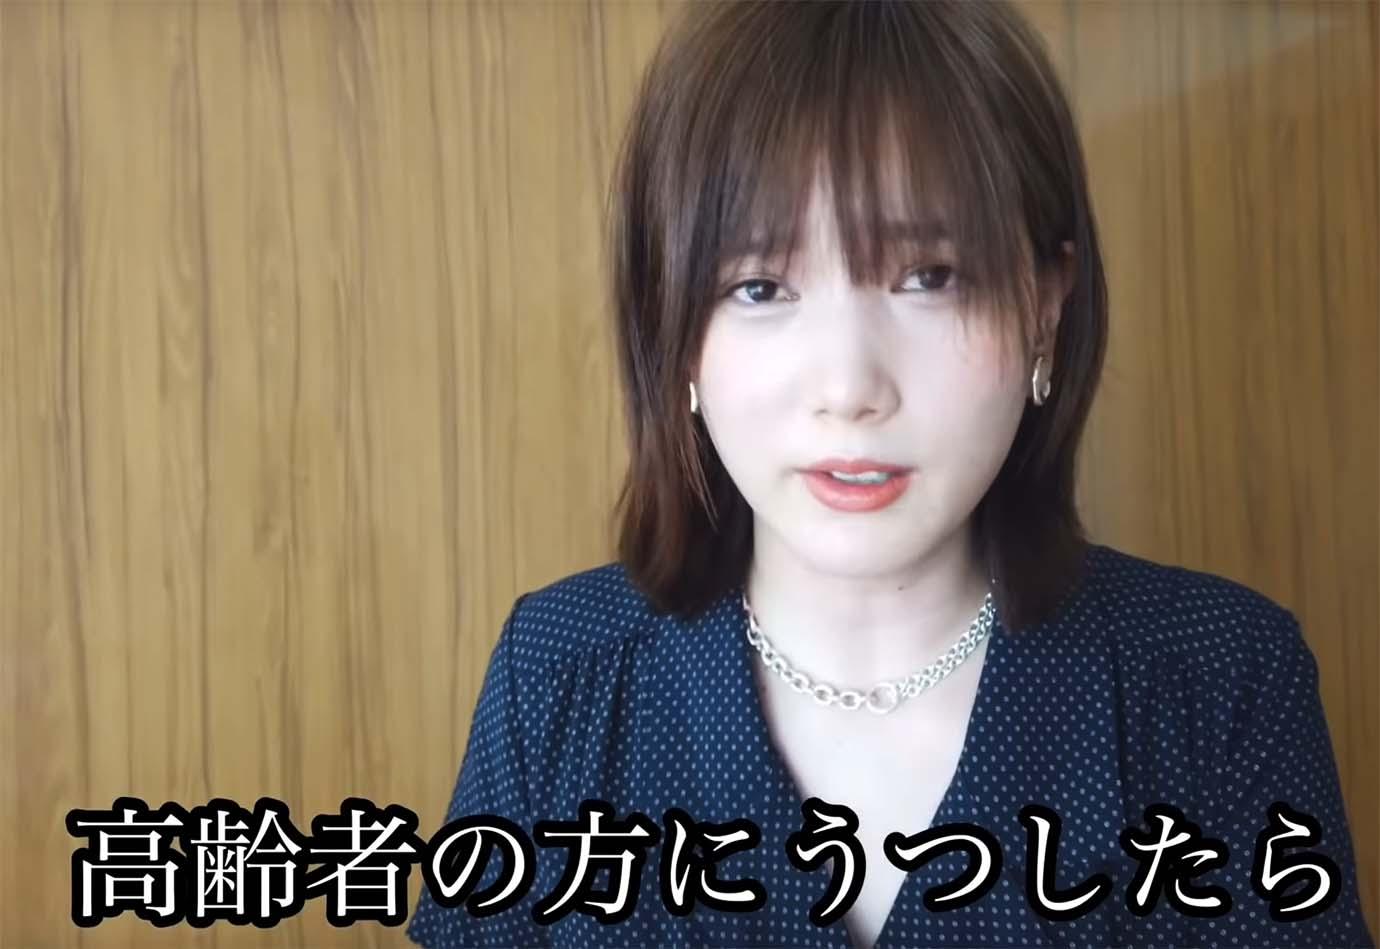 【MORE】本田翼(ばっさー)part50【ぐるナイ・ゴチ】 YouTube動画>13本 ->画像>156枚